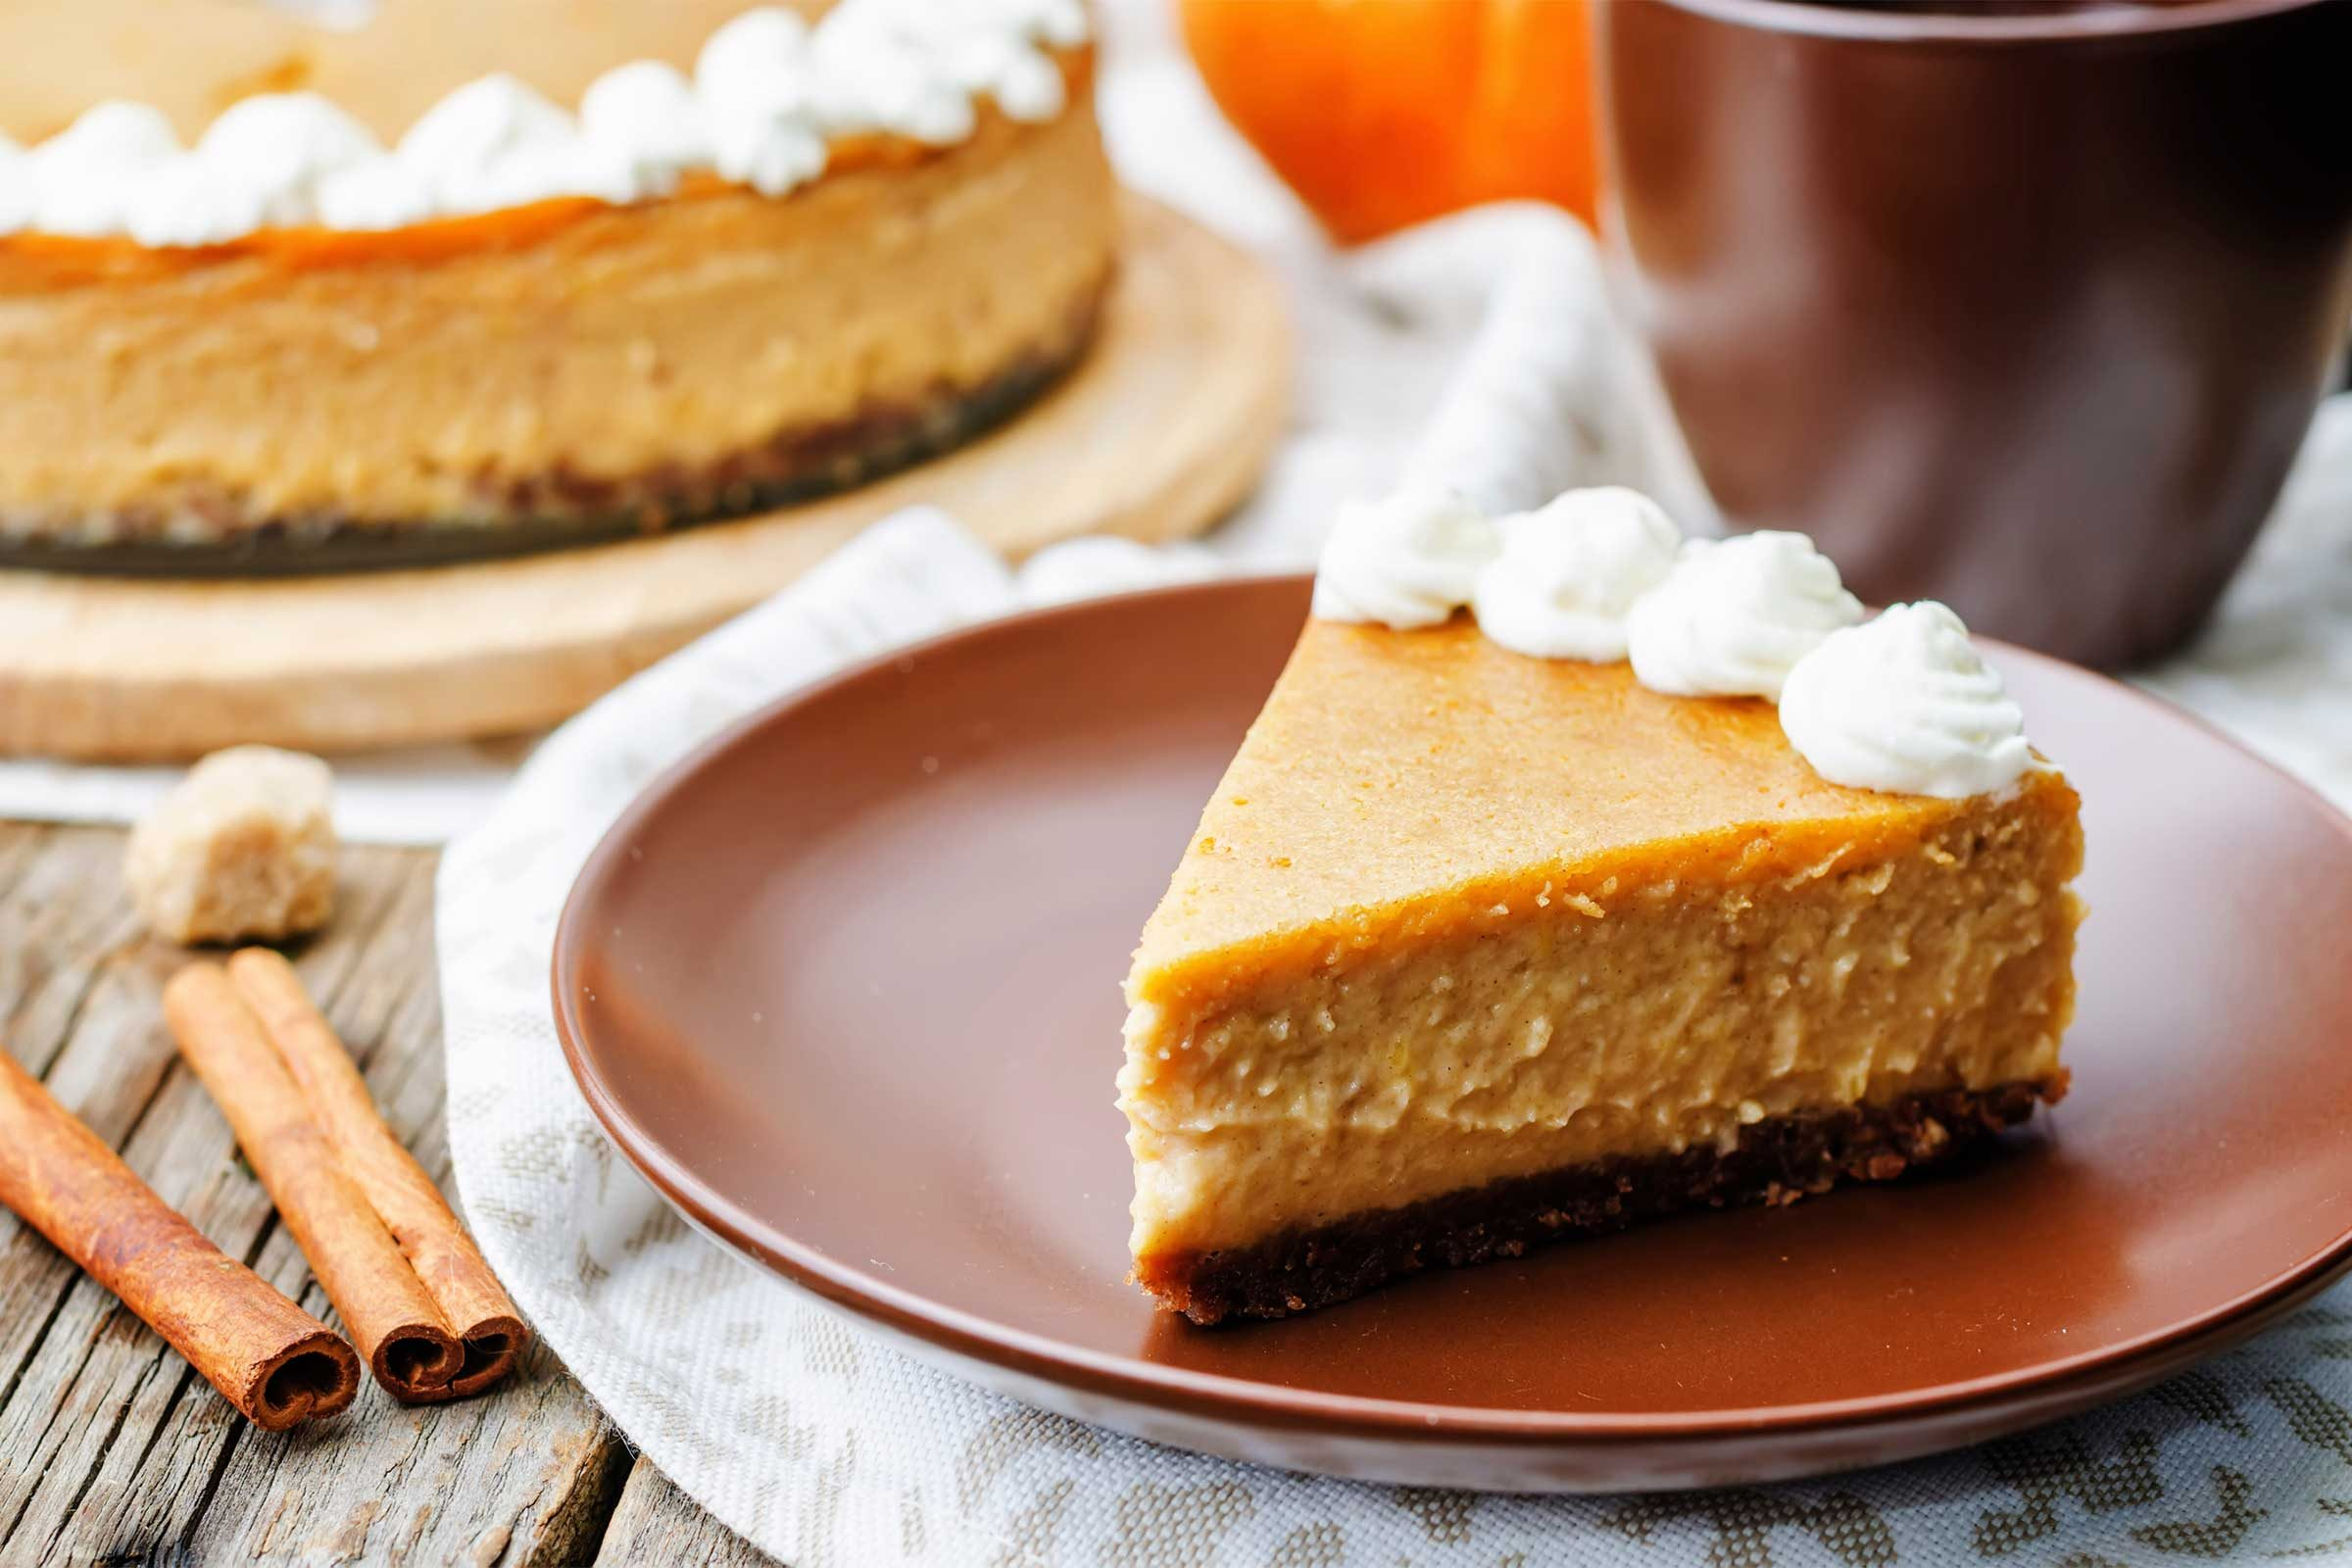 Refrain from overindulging